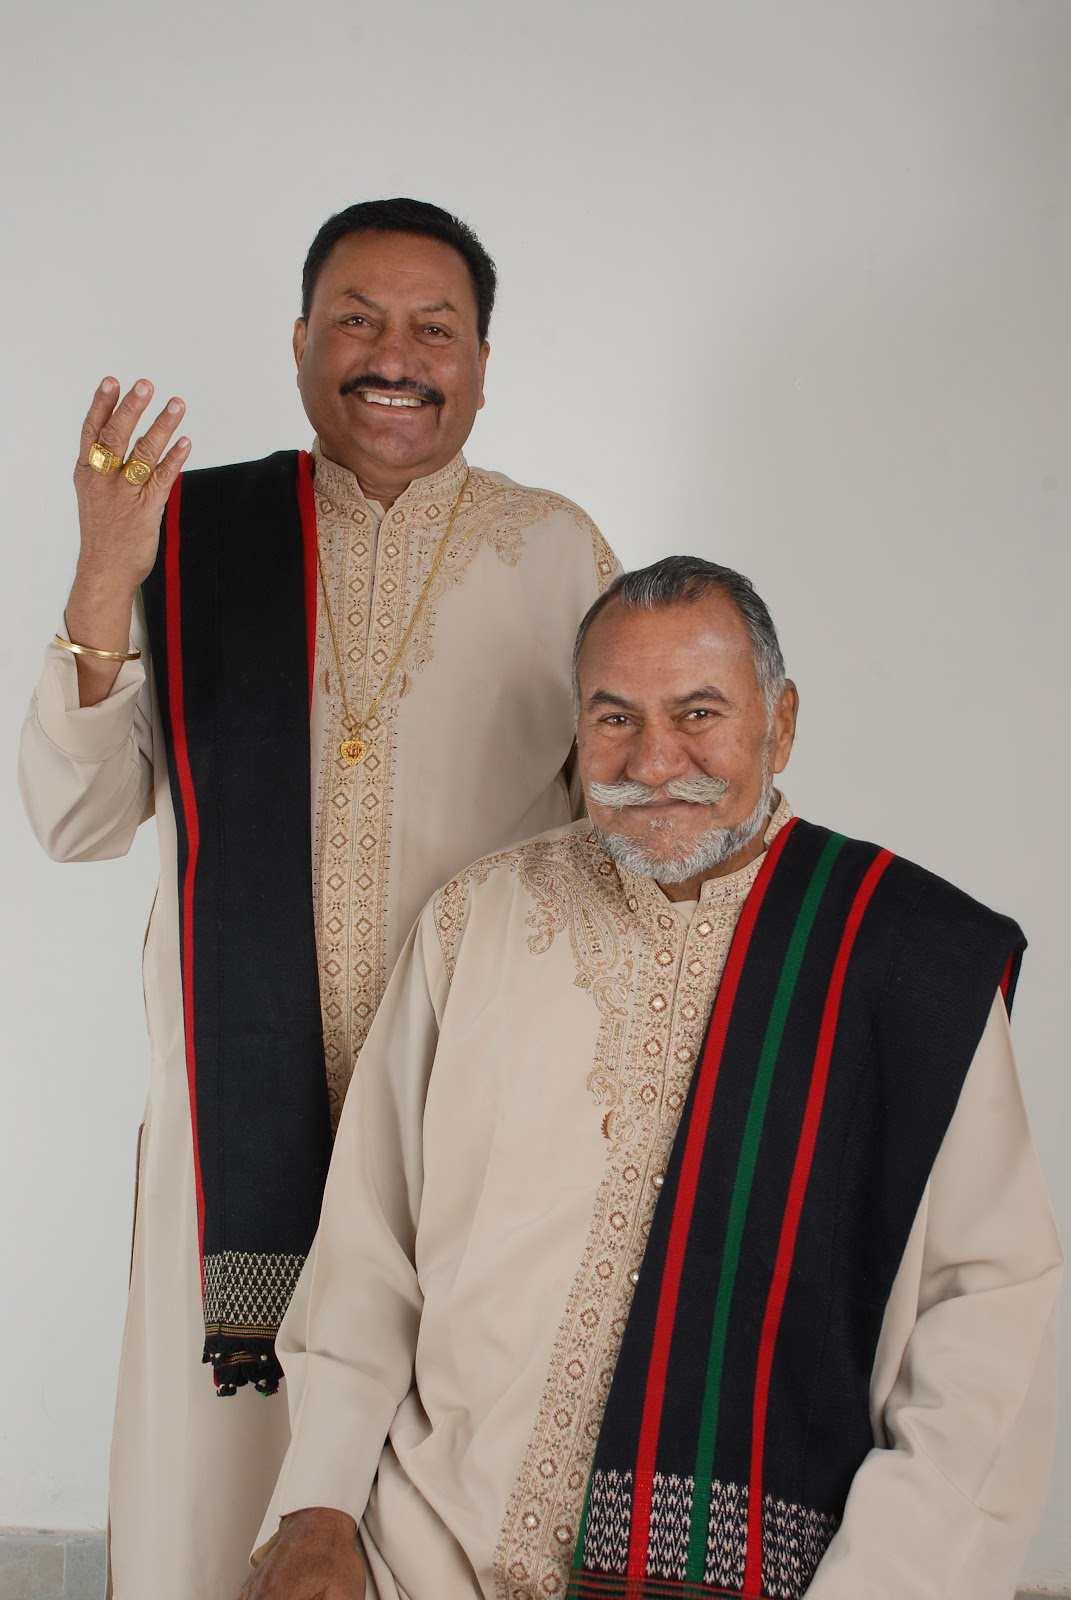 3-wadali-brothers-puran-chand-piyarey-lal-compressed